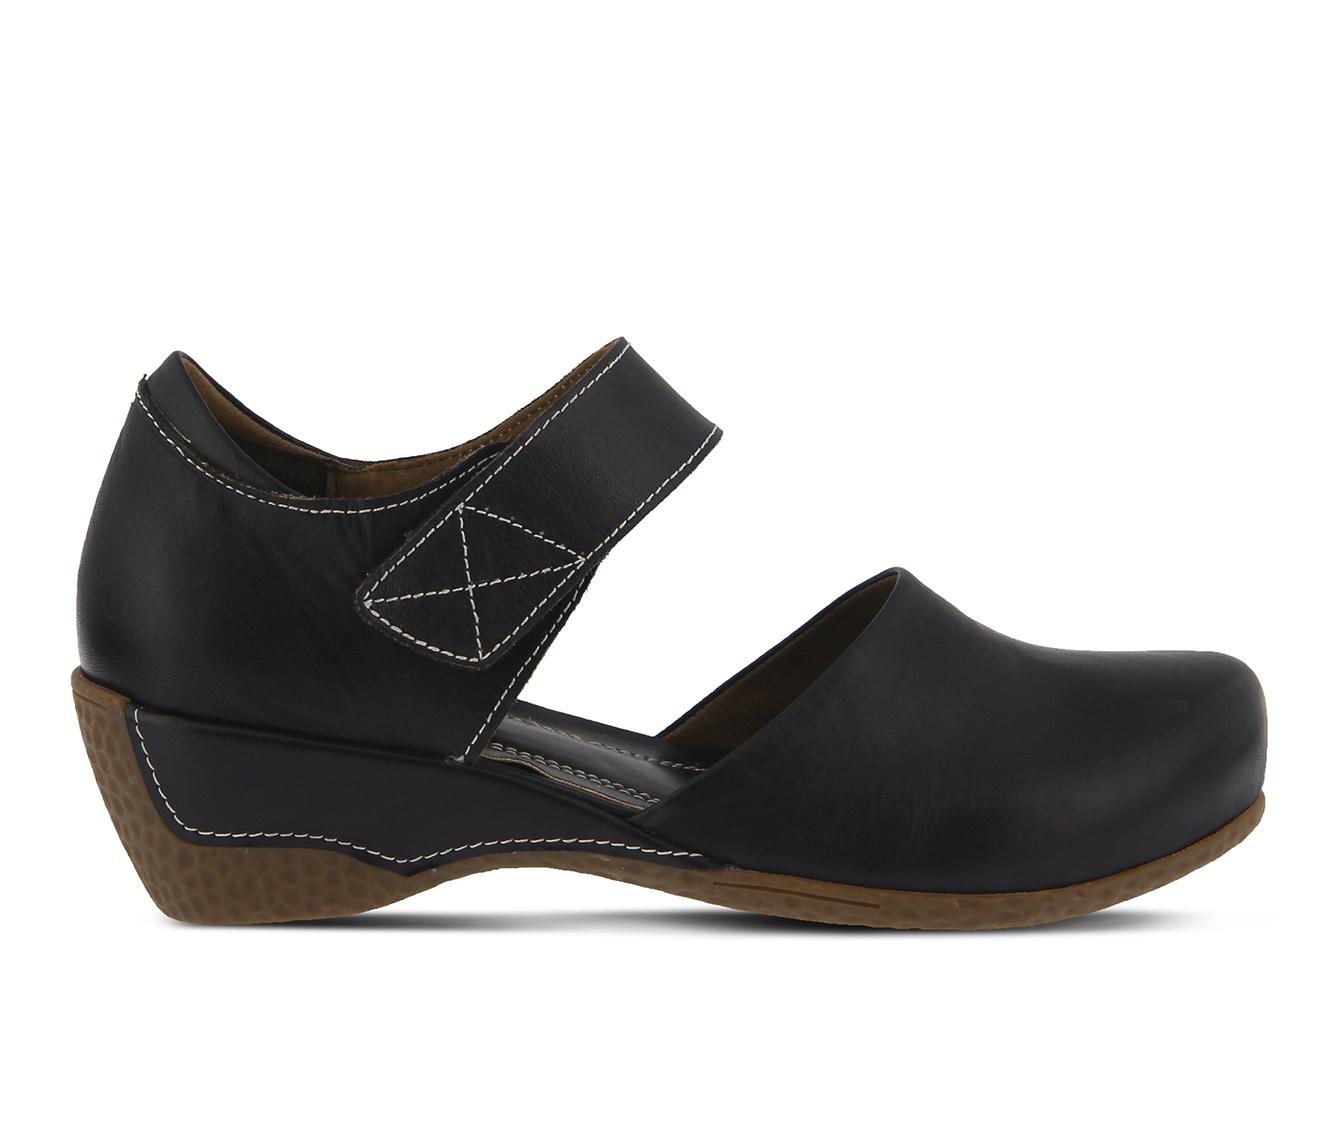 L'Artiste Gloss Women's Shoe (Black Leather)